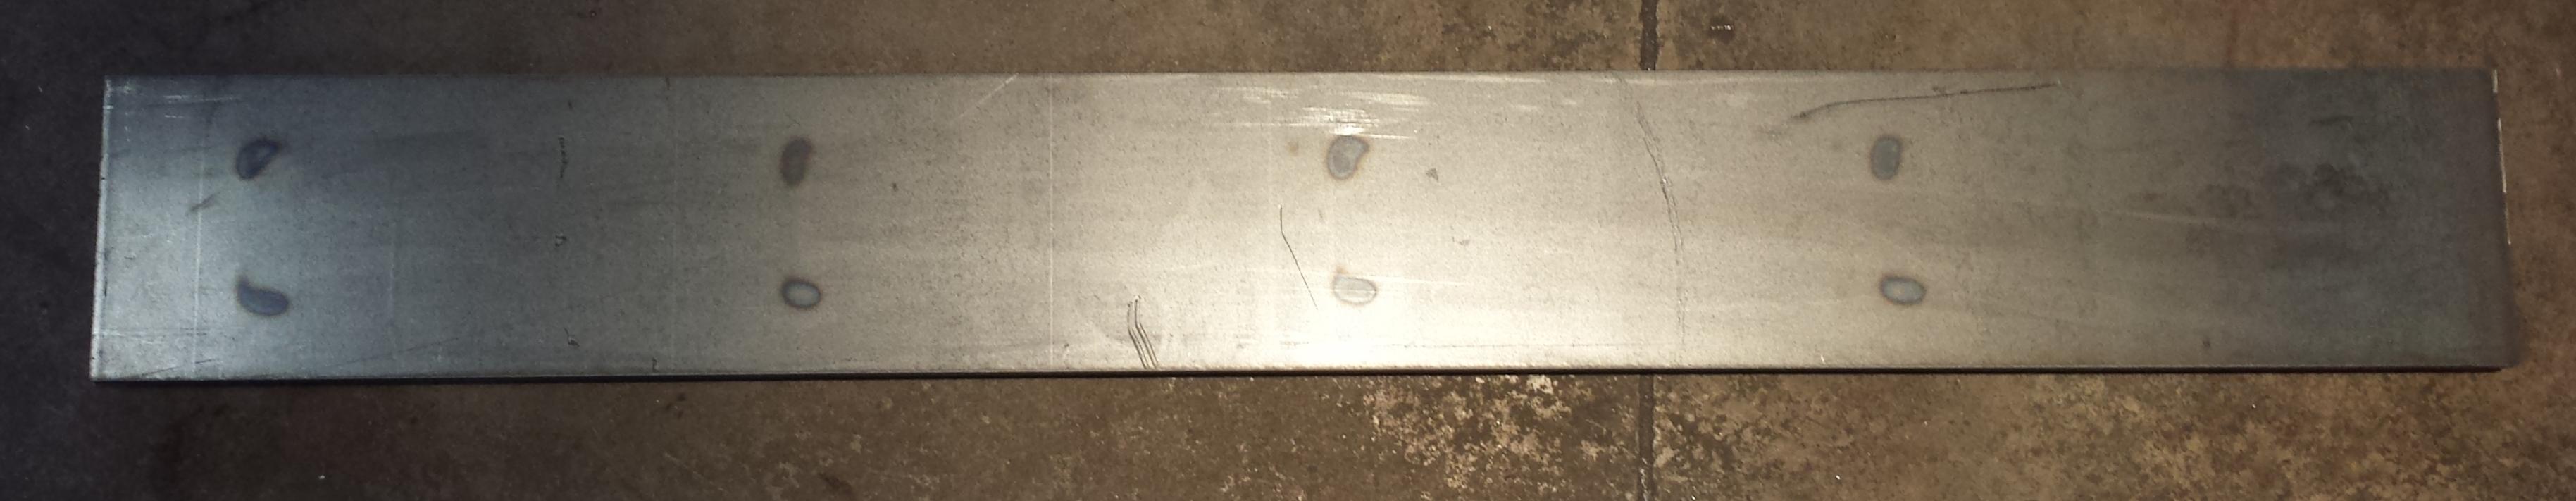 drain-covers-2.jpg